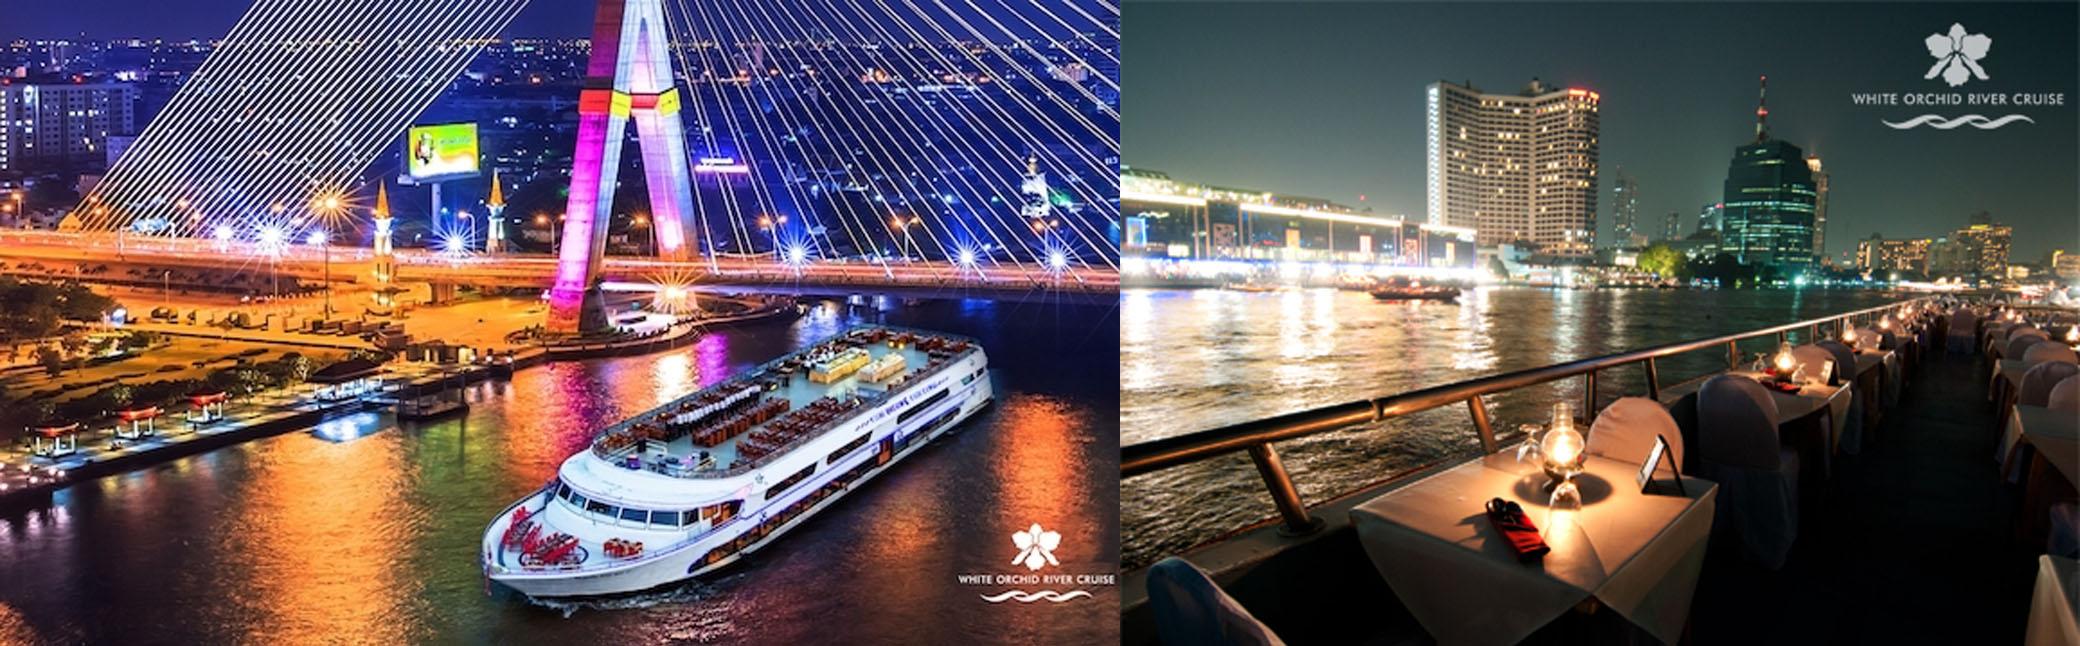 White Orchid River Cruise ล่องเรือแม่น้ำเจ้าพระยา ดินเนอร์  Seafood Buffet by เรือสำราญ